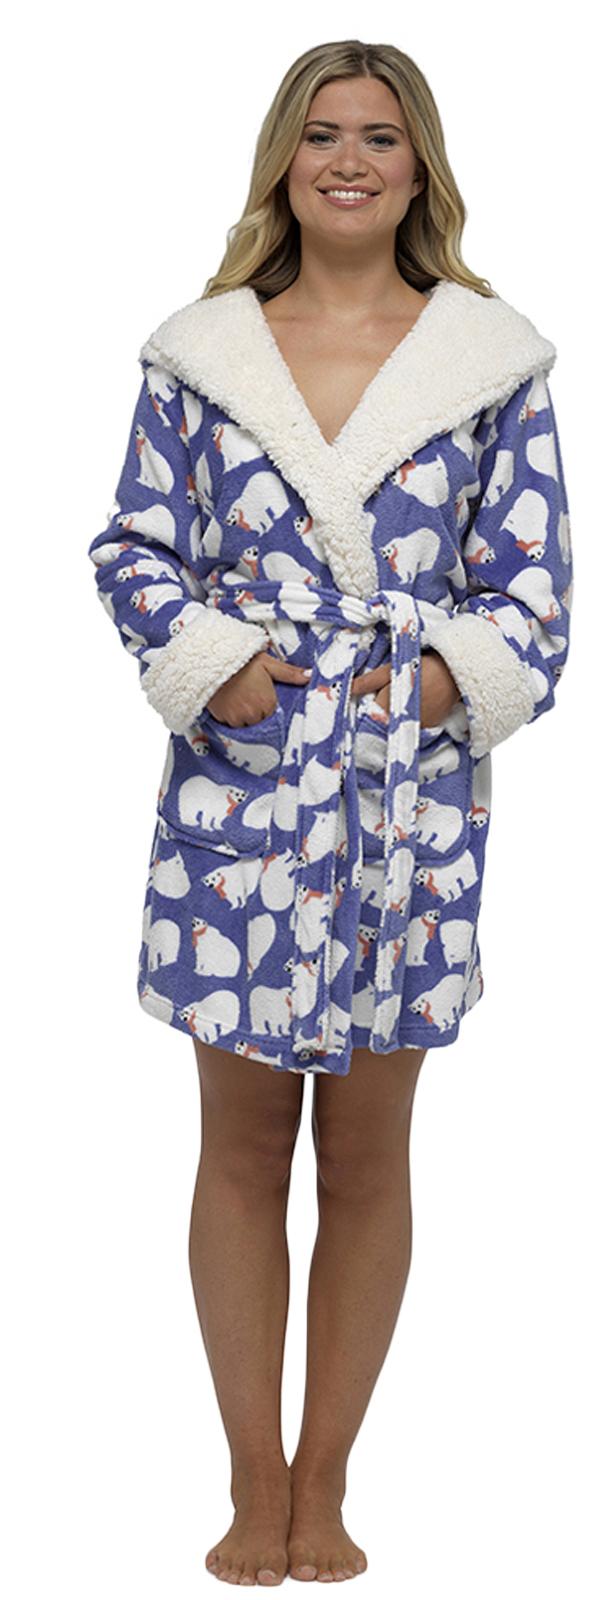 195188c226 Womens Short Hooded Dressing Gown Bath Robe Housecoat + Belt Ladies ...